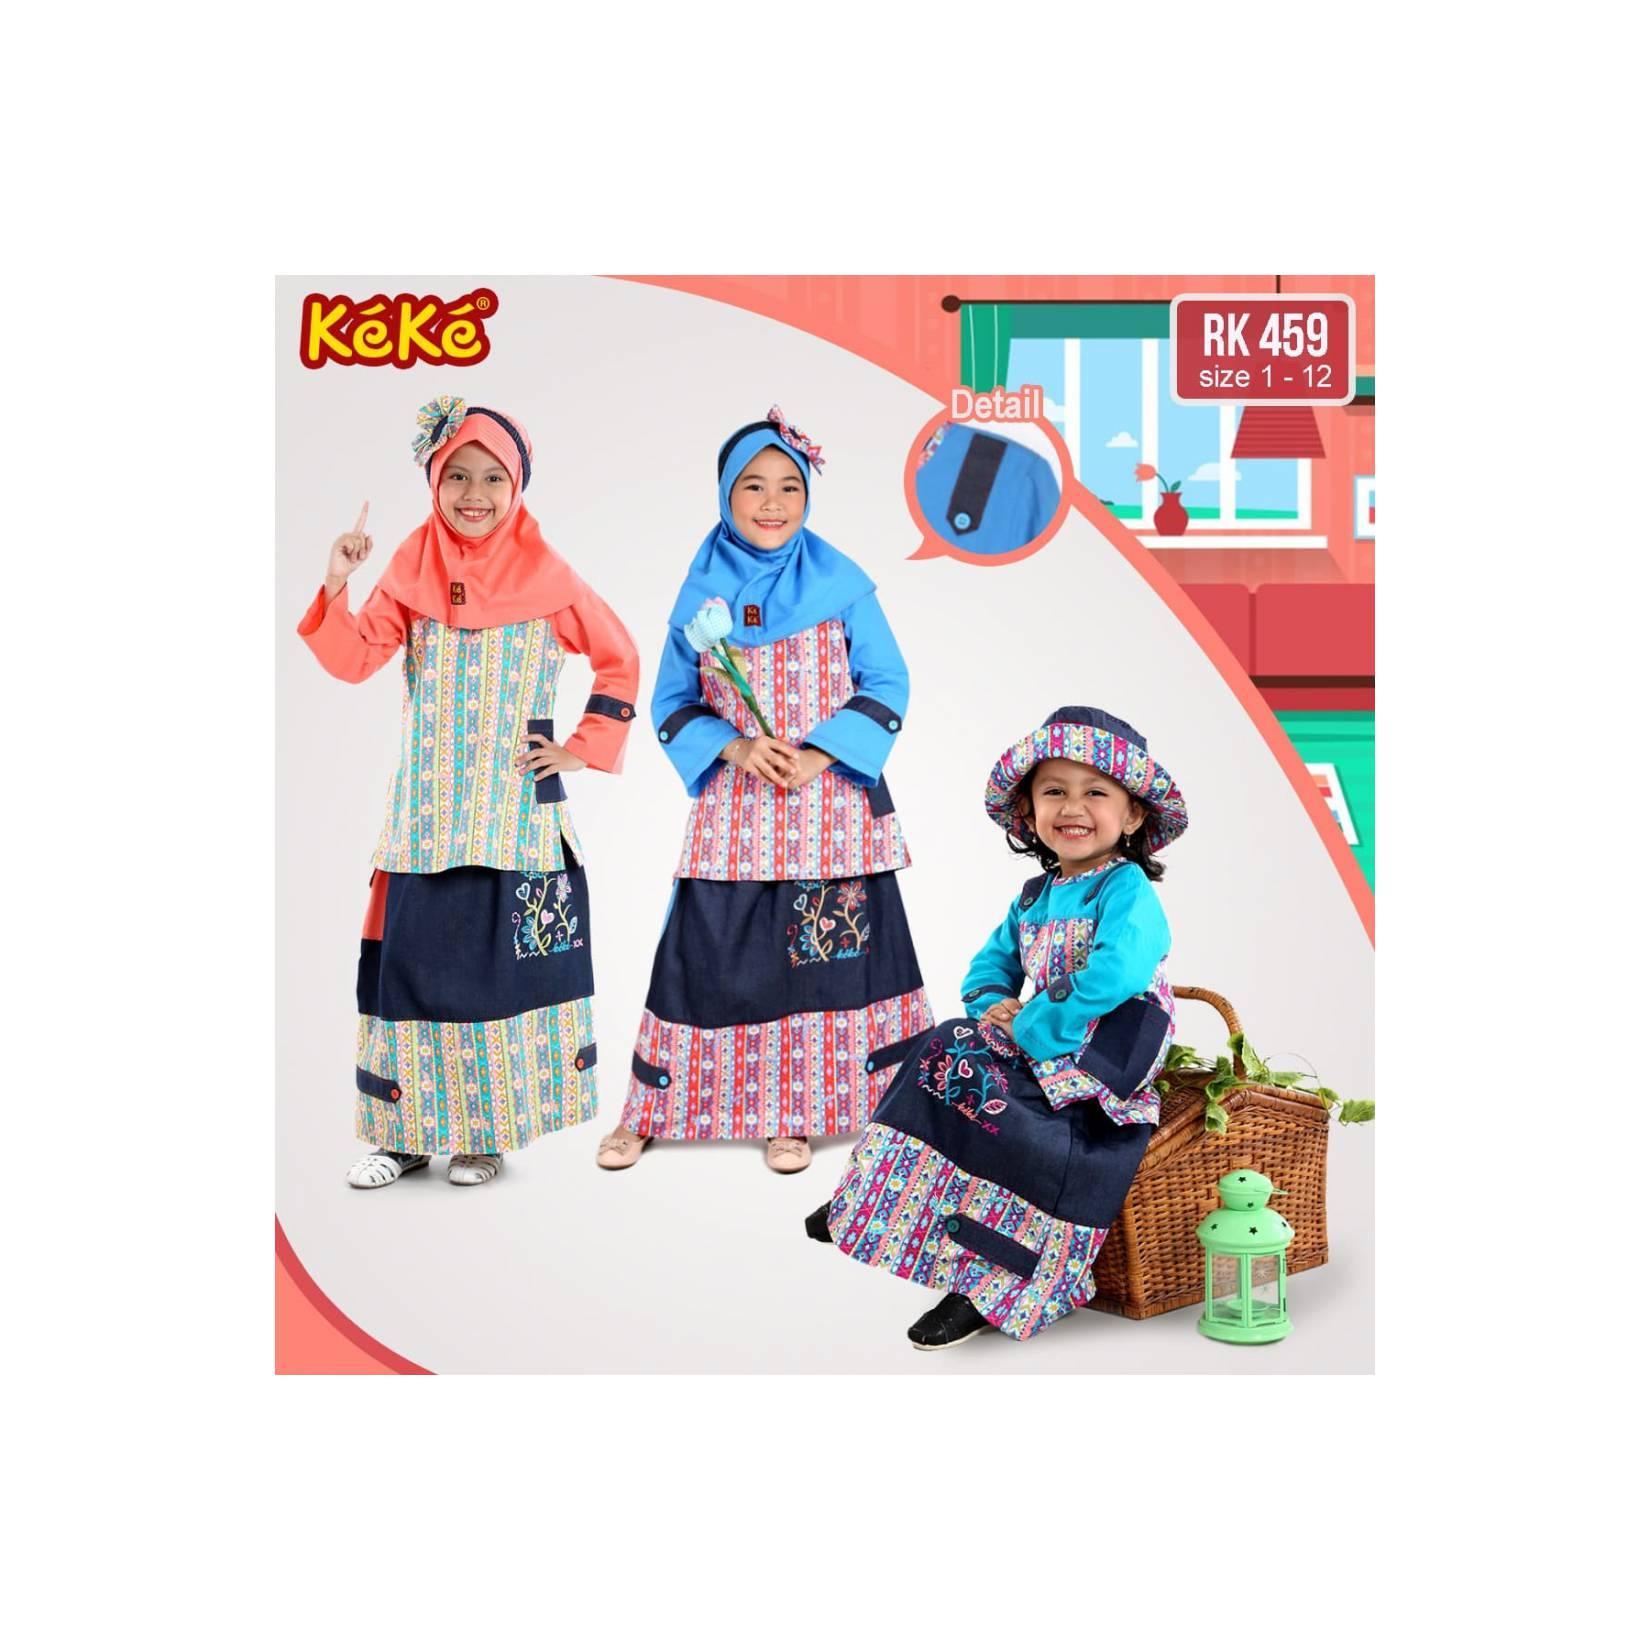 gamis anak/baju muslim anak keke size 8